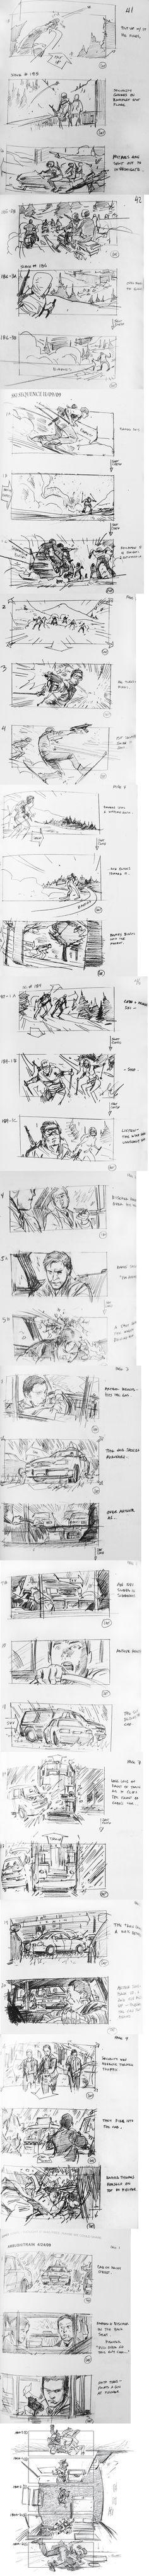 Gabriel Hardman Drawings Board Chris Nolan Inception    *Storyboard